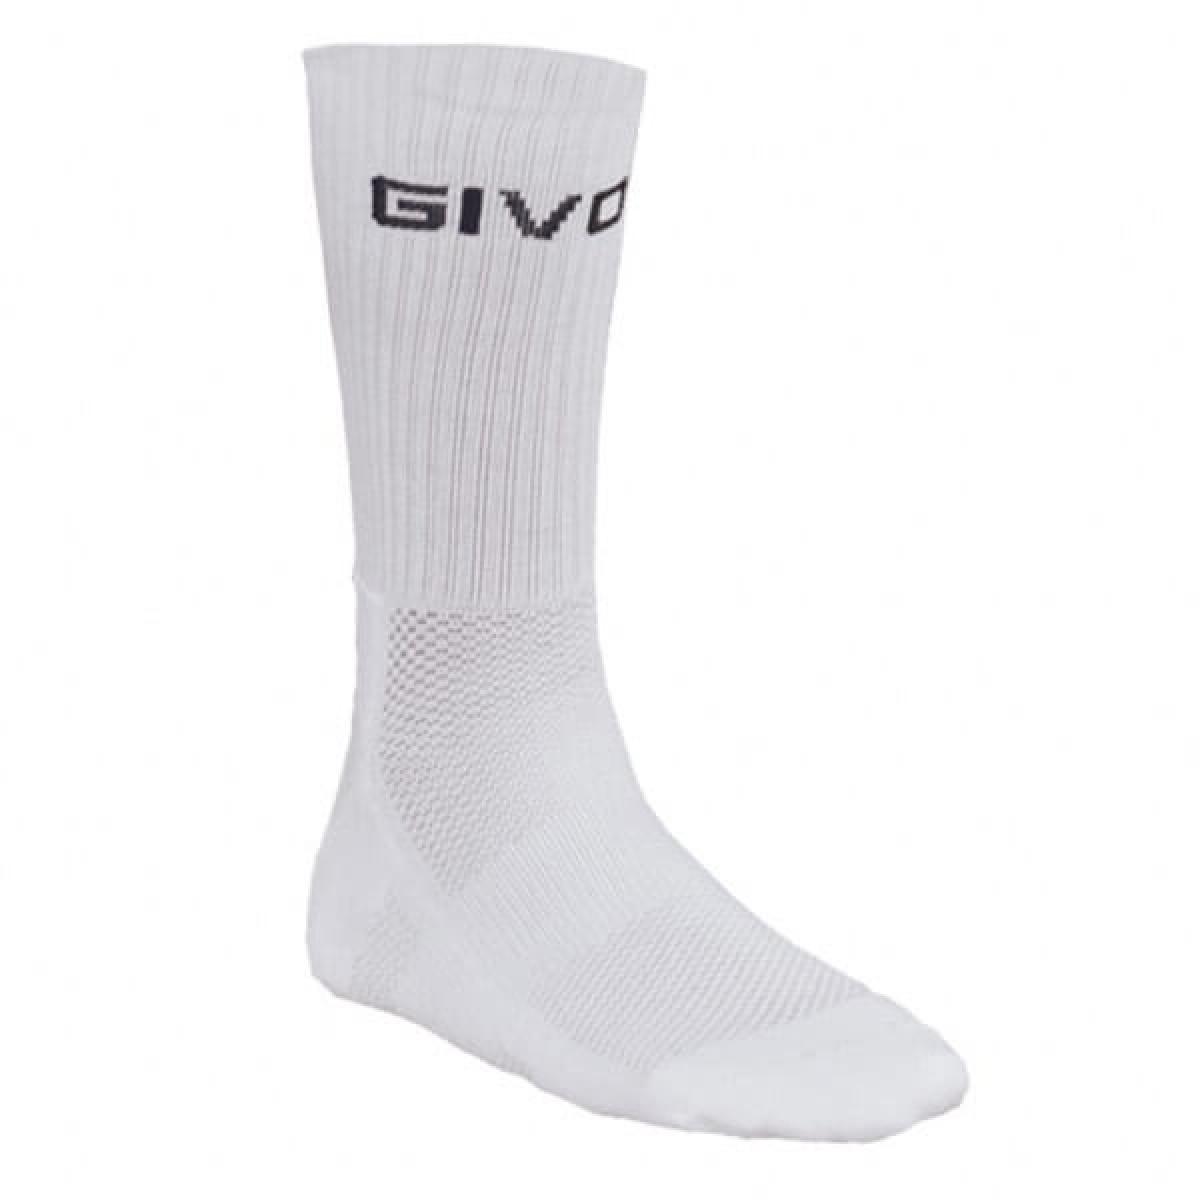 Givova Calza Sport strømpe hvid